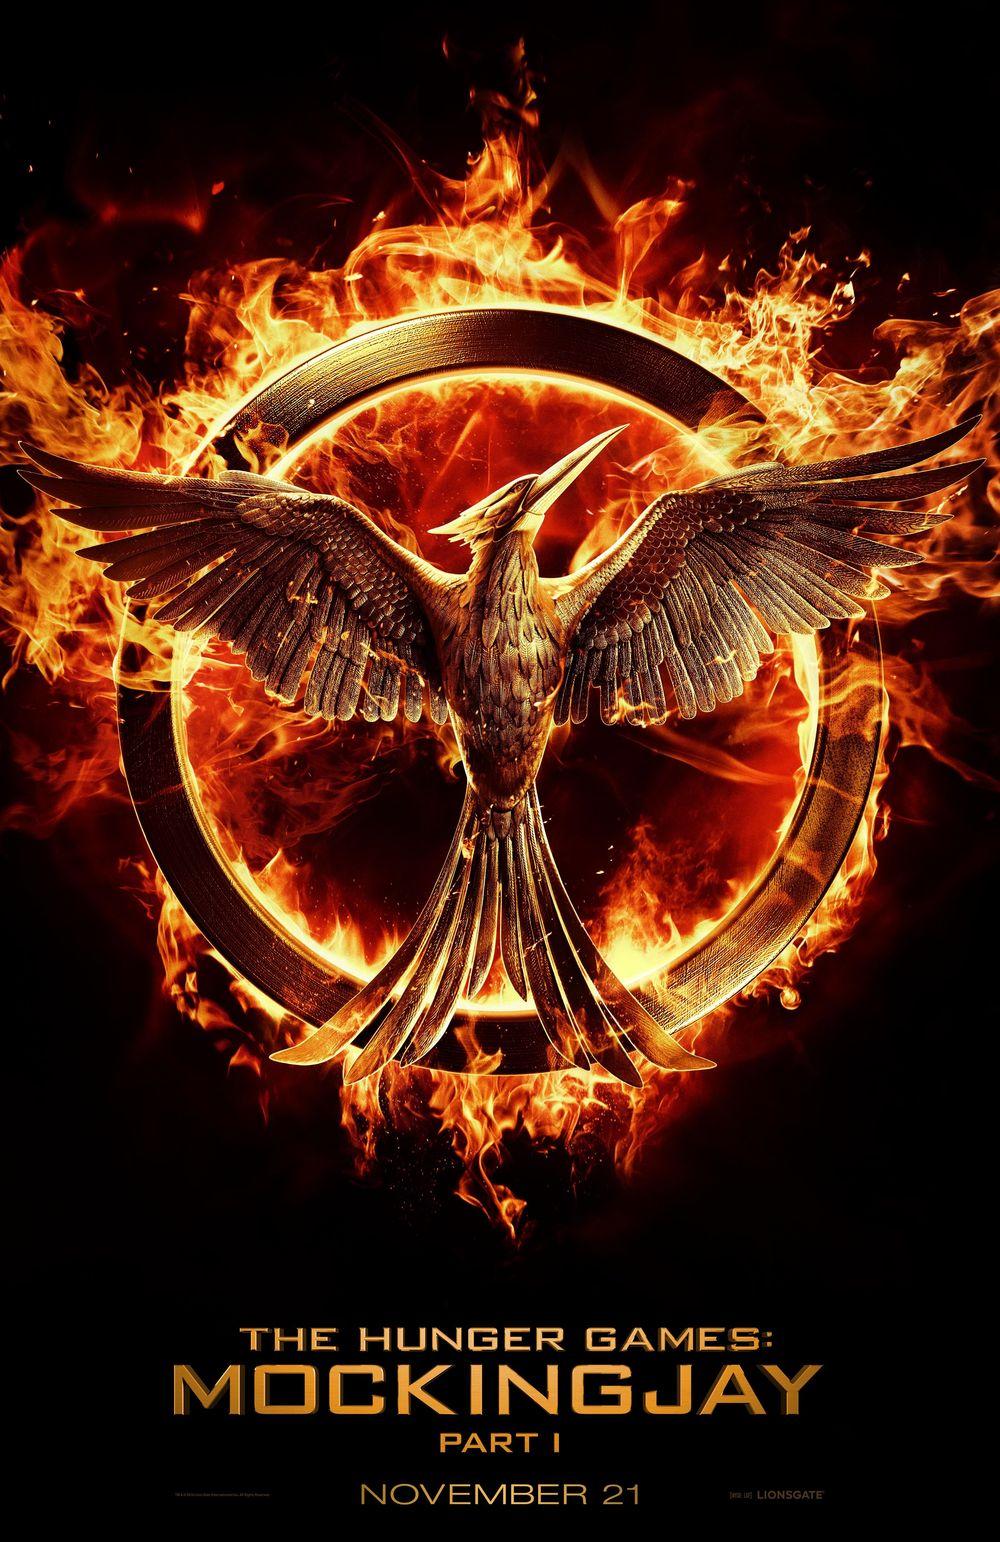 The Hunger Games: Mockingjay - Part 1 (2014) - IMDb